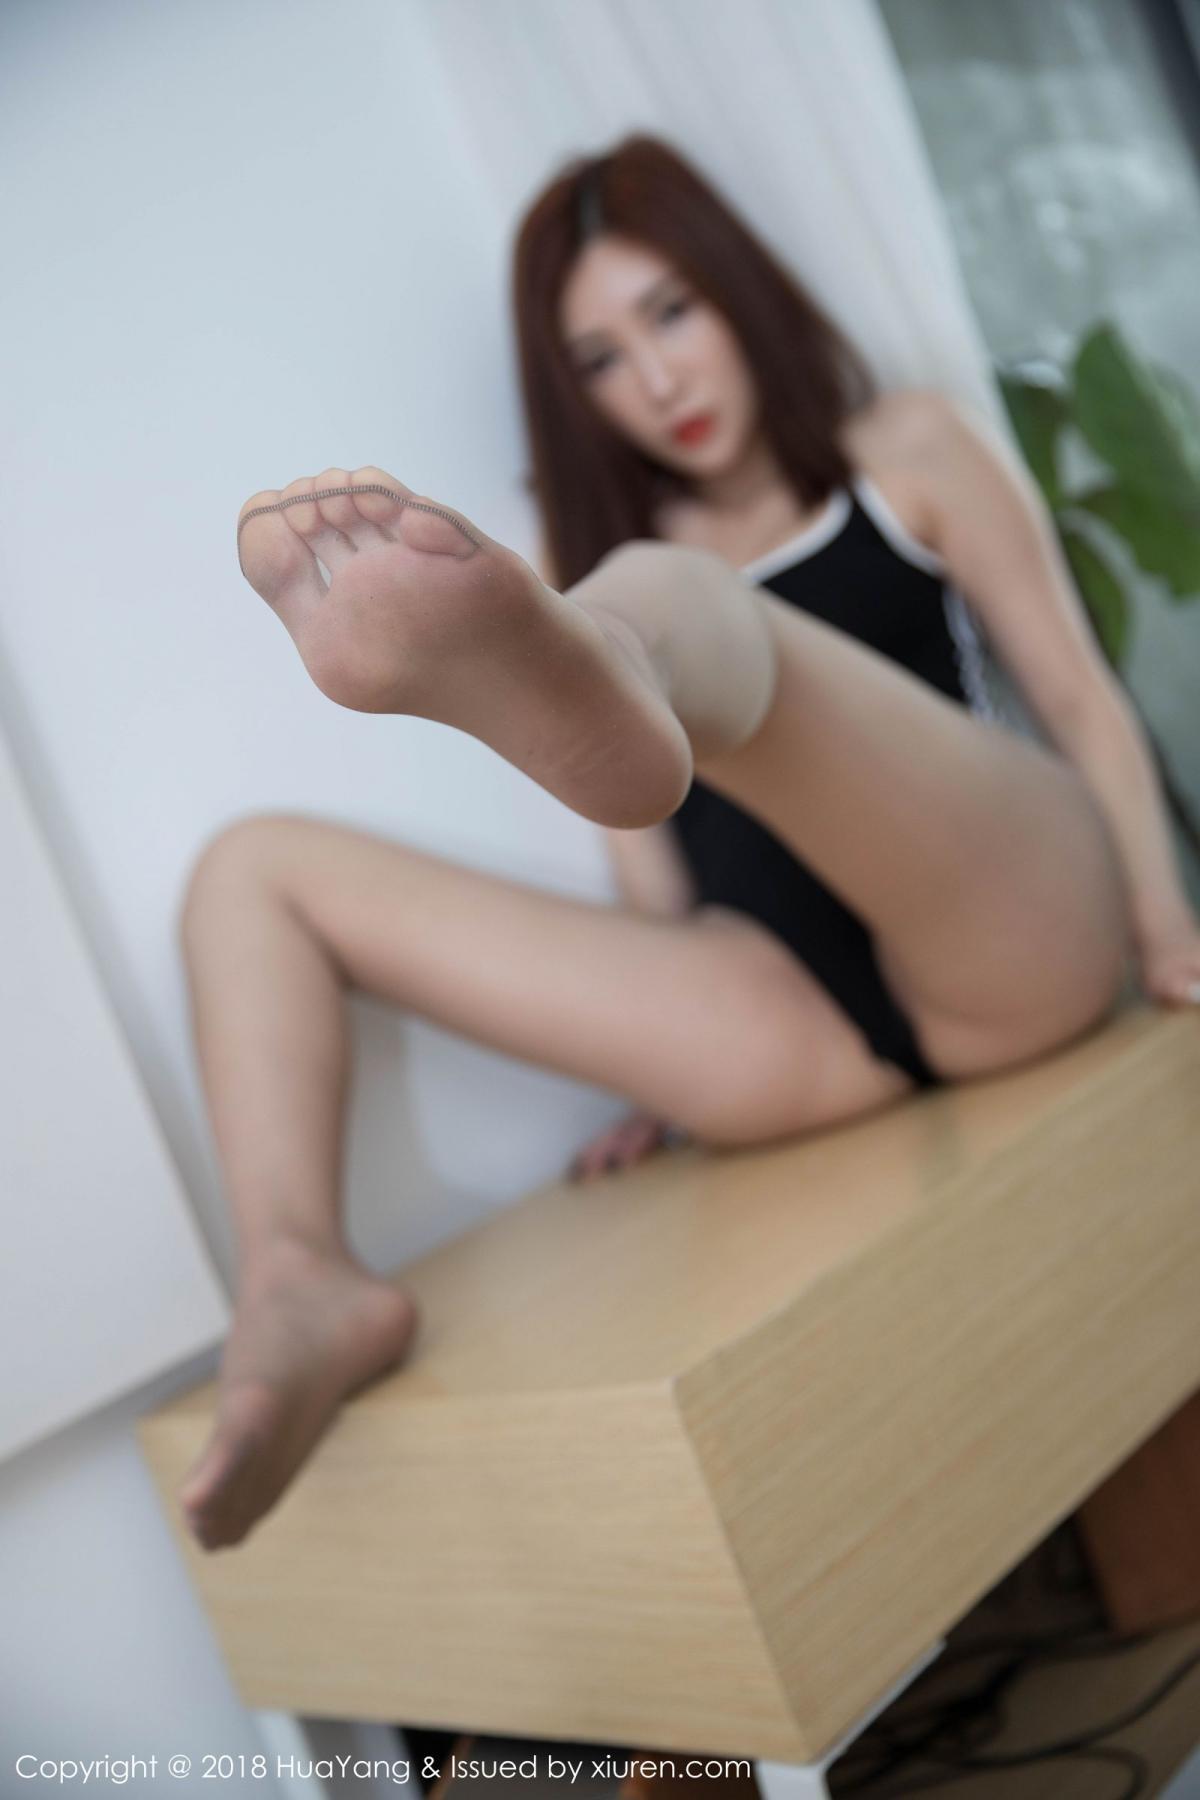 [Huayang] Vol.092 Sun Meng Yao 42P, HuaYang, Nurse, Sun Meng Yao, Tall, Uniform